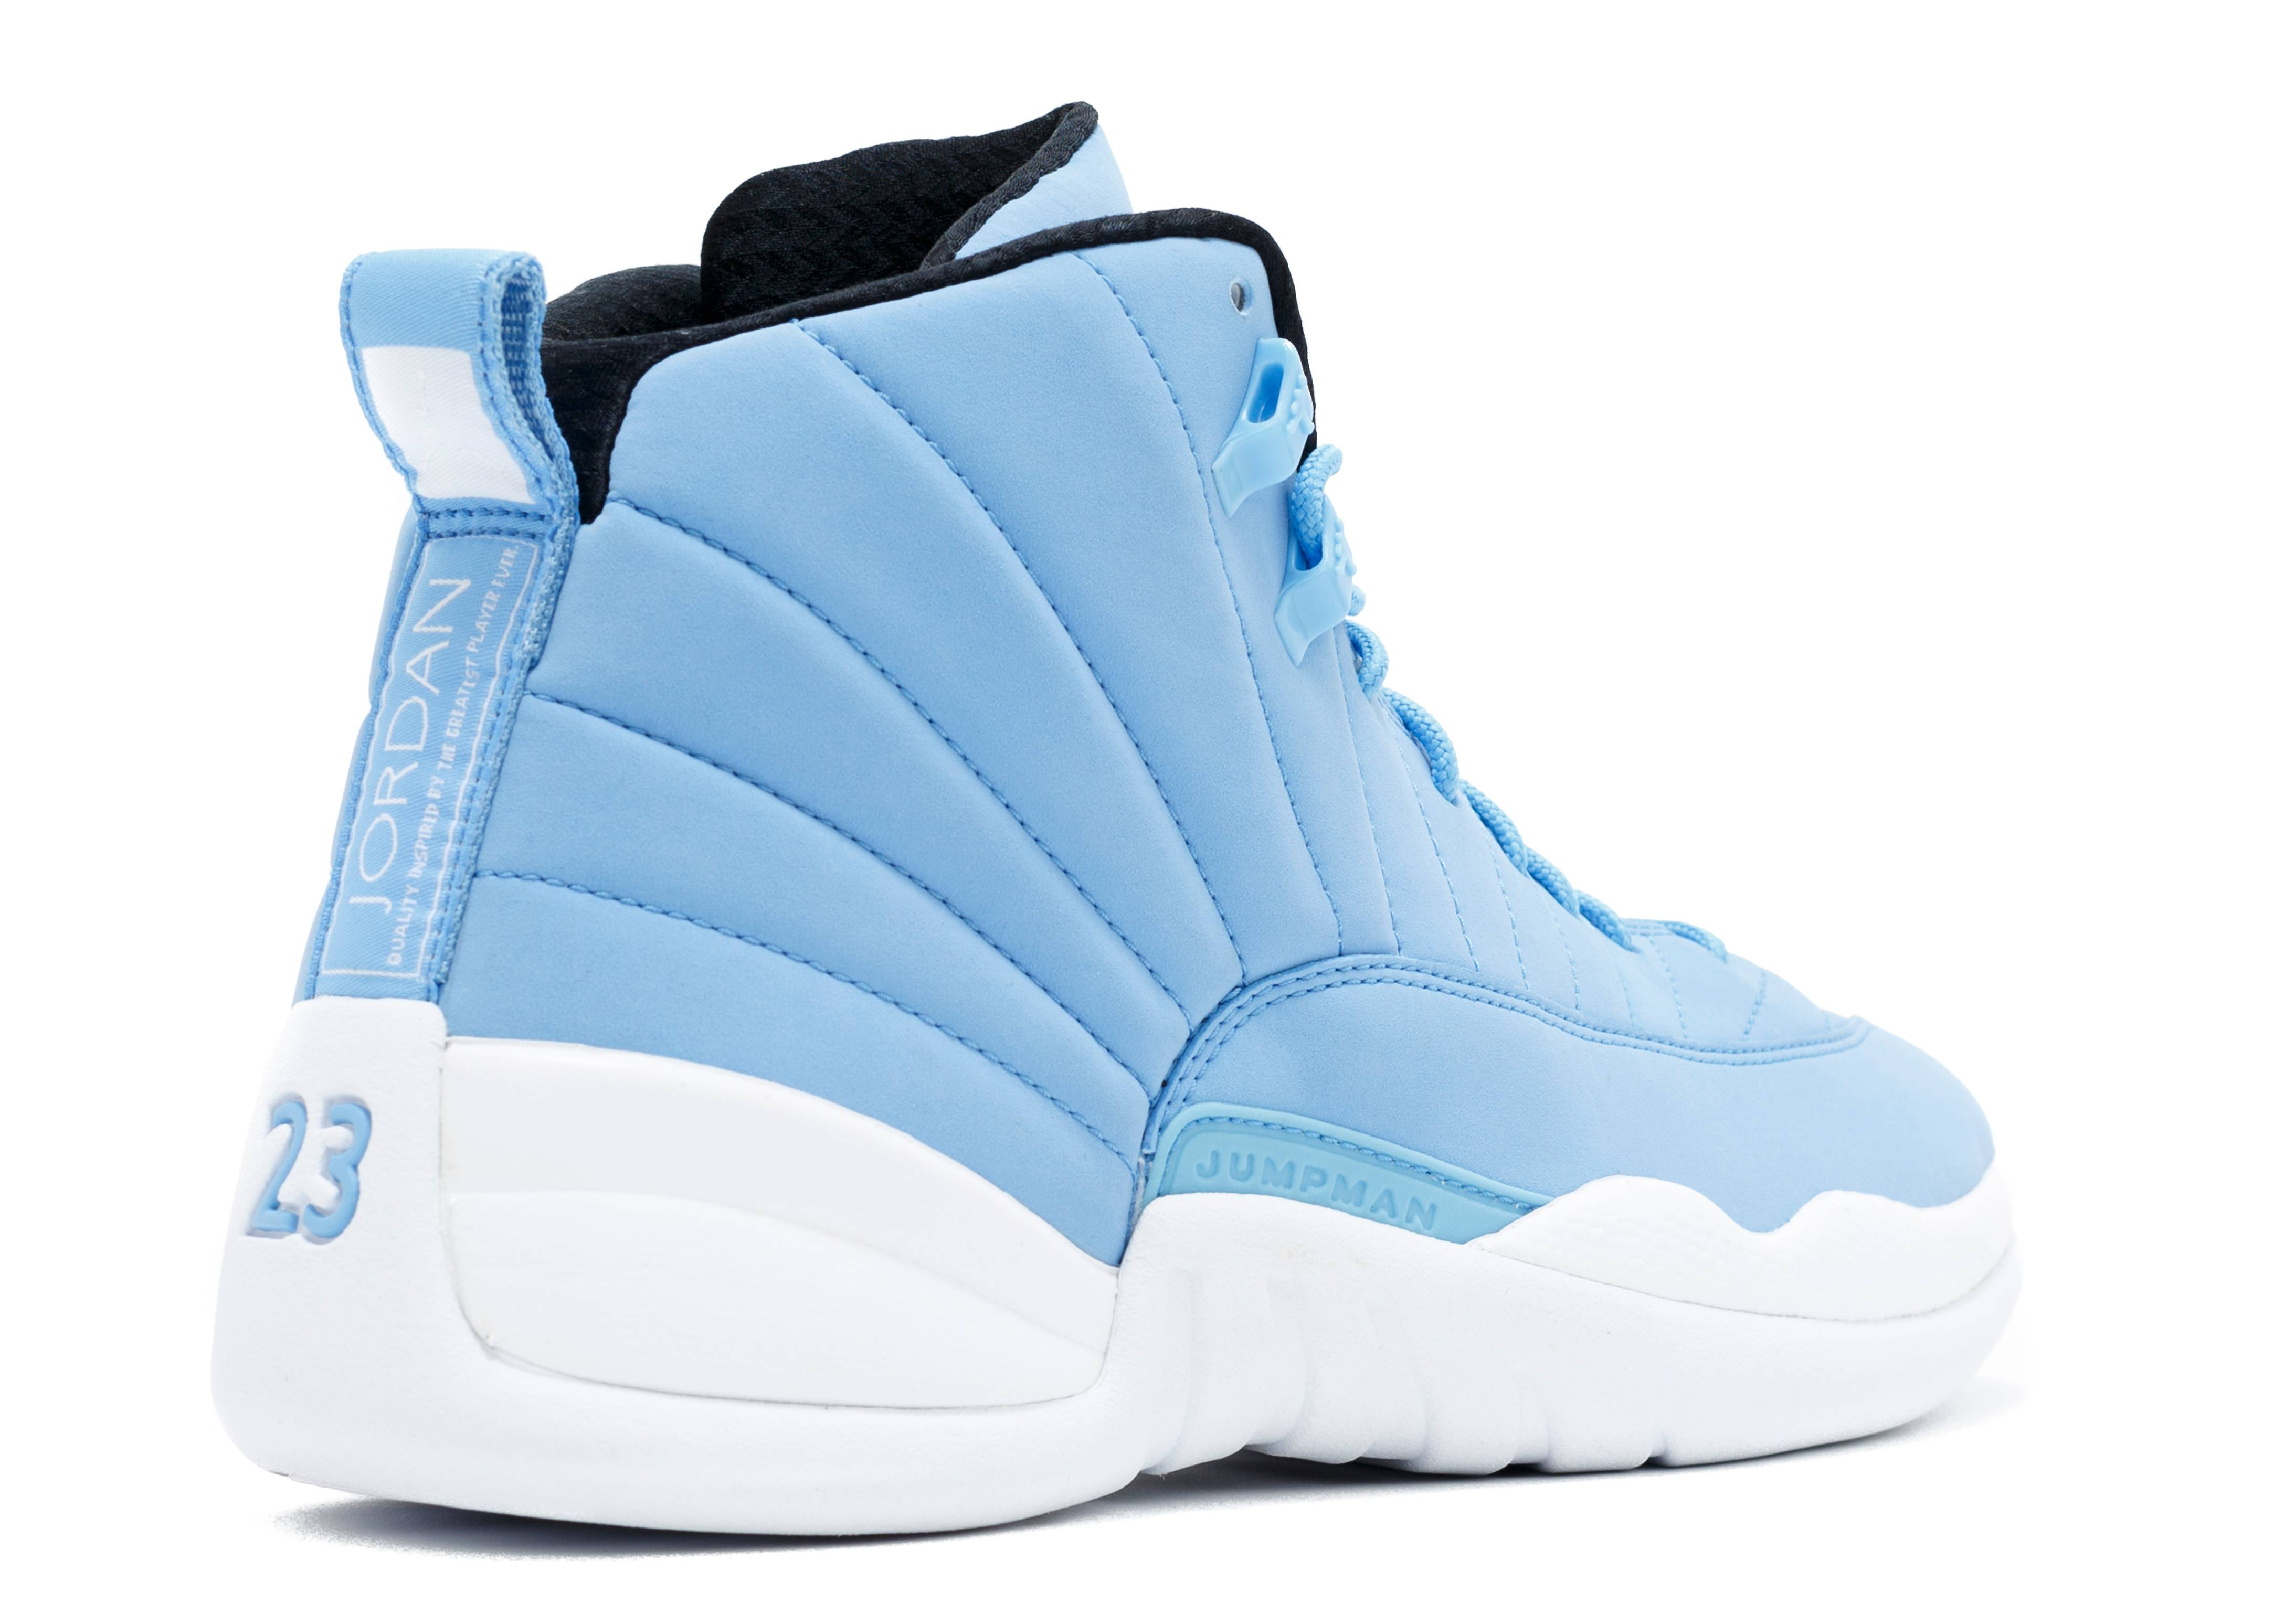 9f7f3e789d6 Air Jordan 12